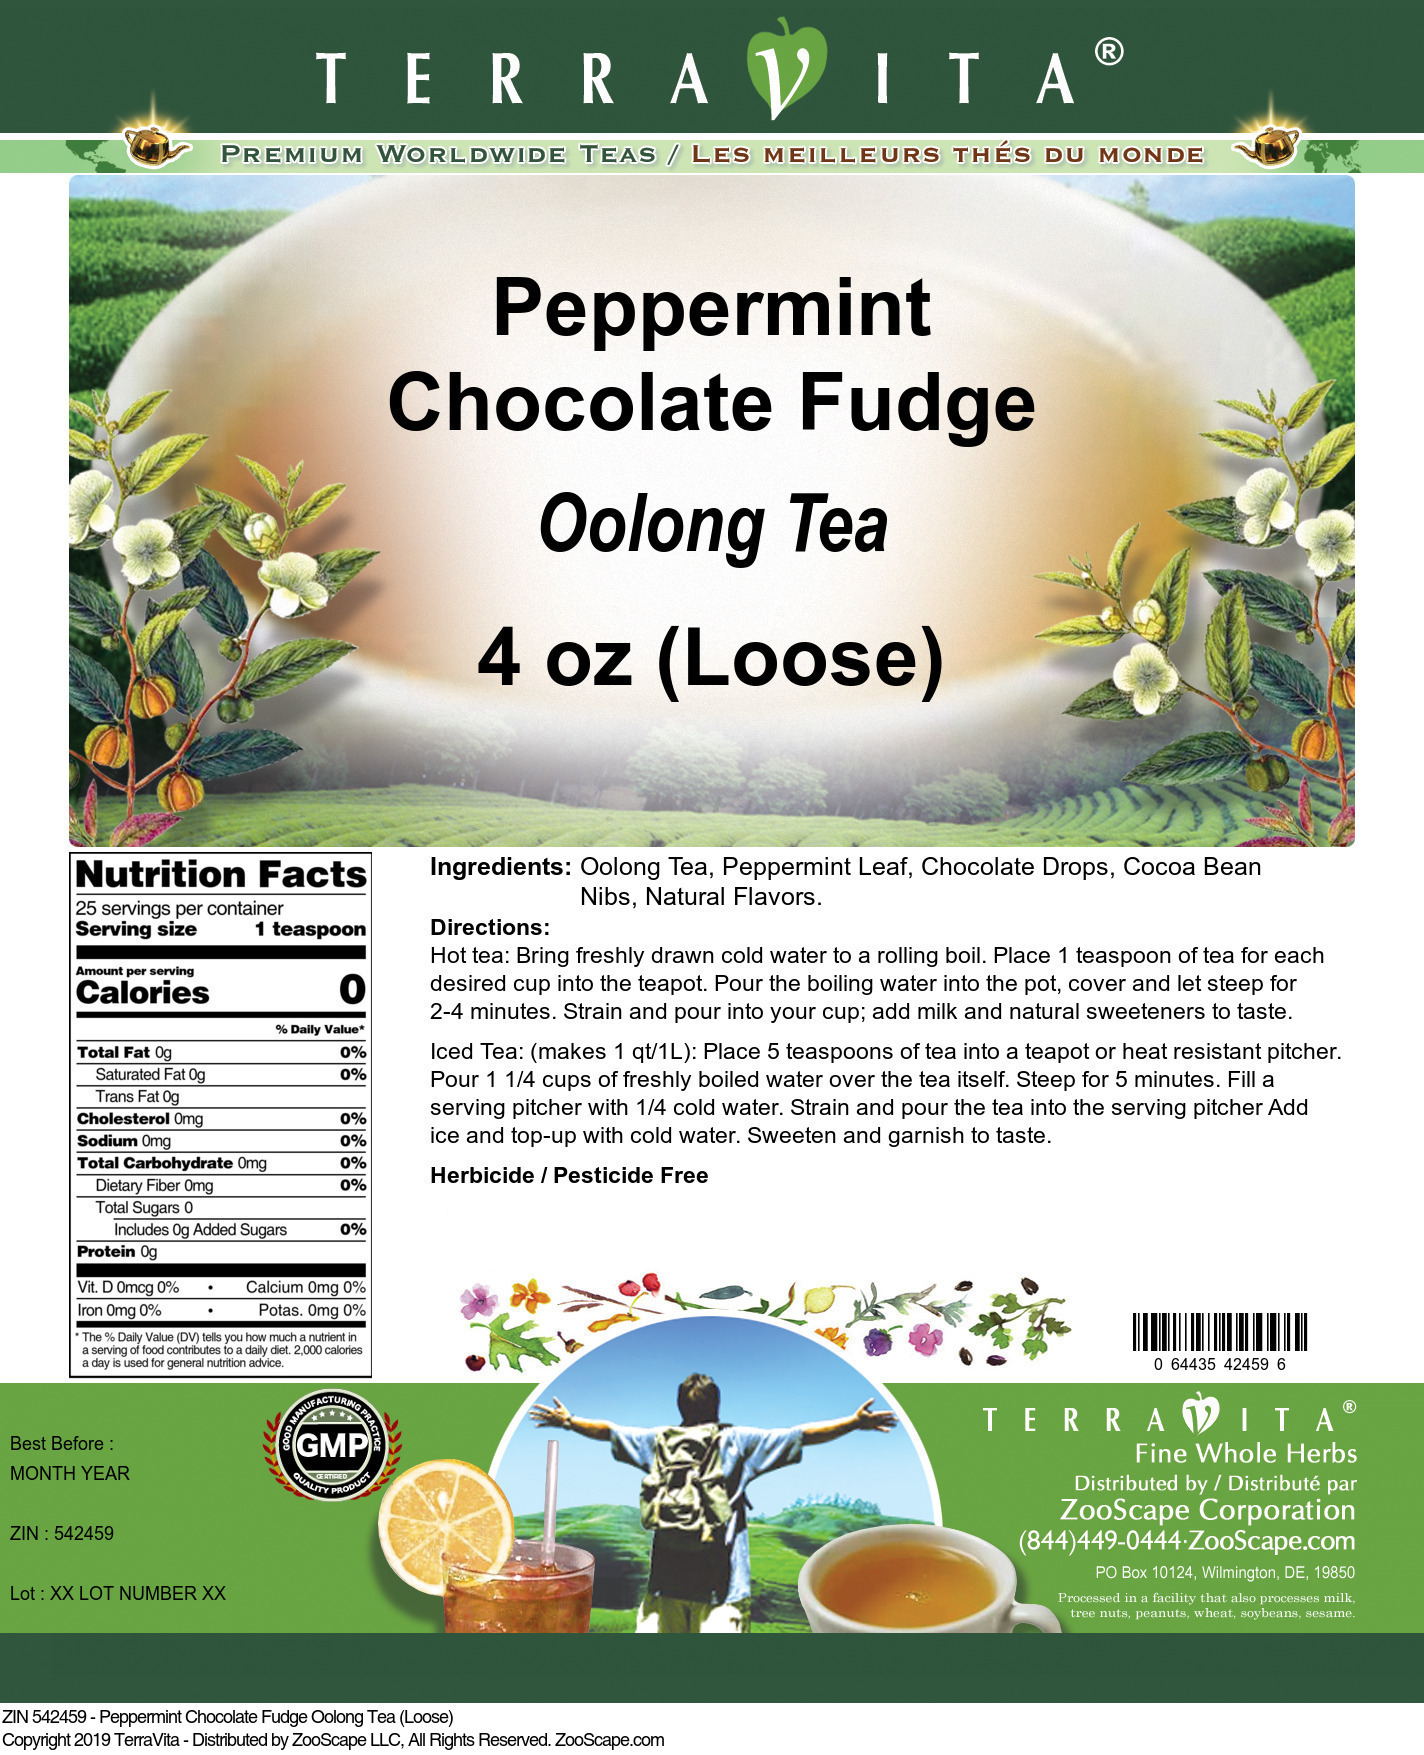 Peppermint Chocolate Fudge Oolong Tea (Loose)